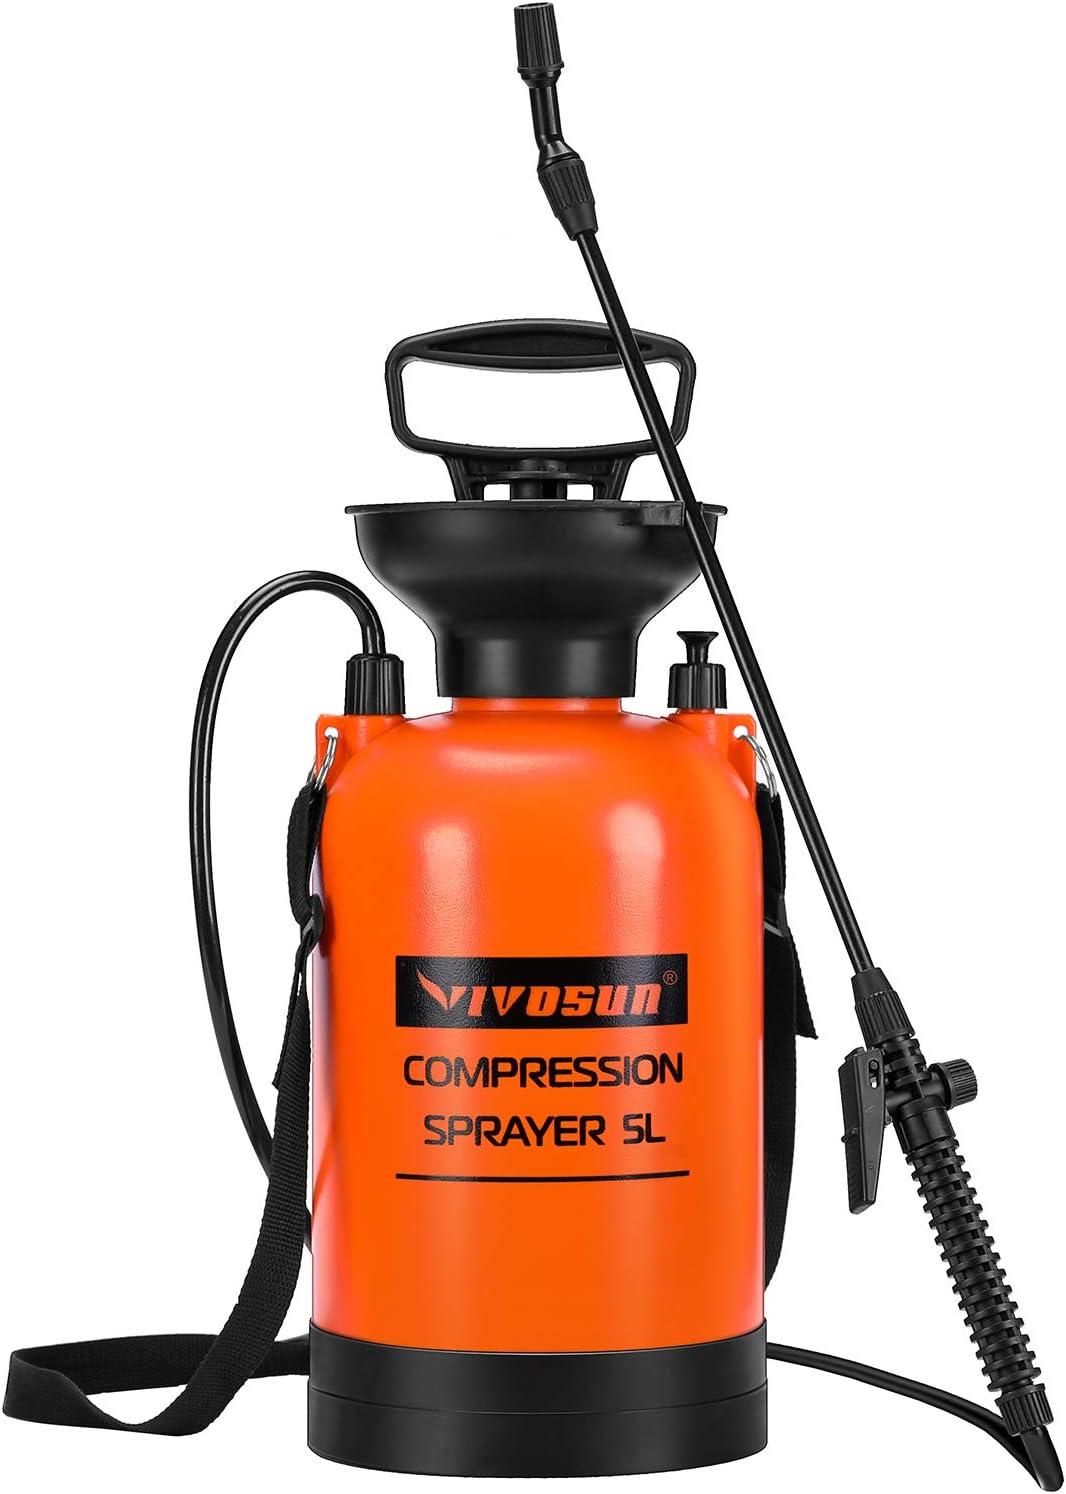 VIVOSUN 1.3 Gallon Lawn and Garden Pump Pressure Sprayer with Pressure Relief Valve